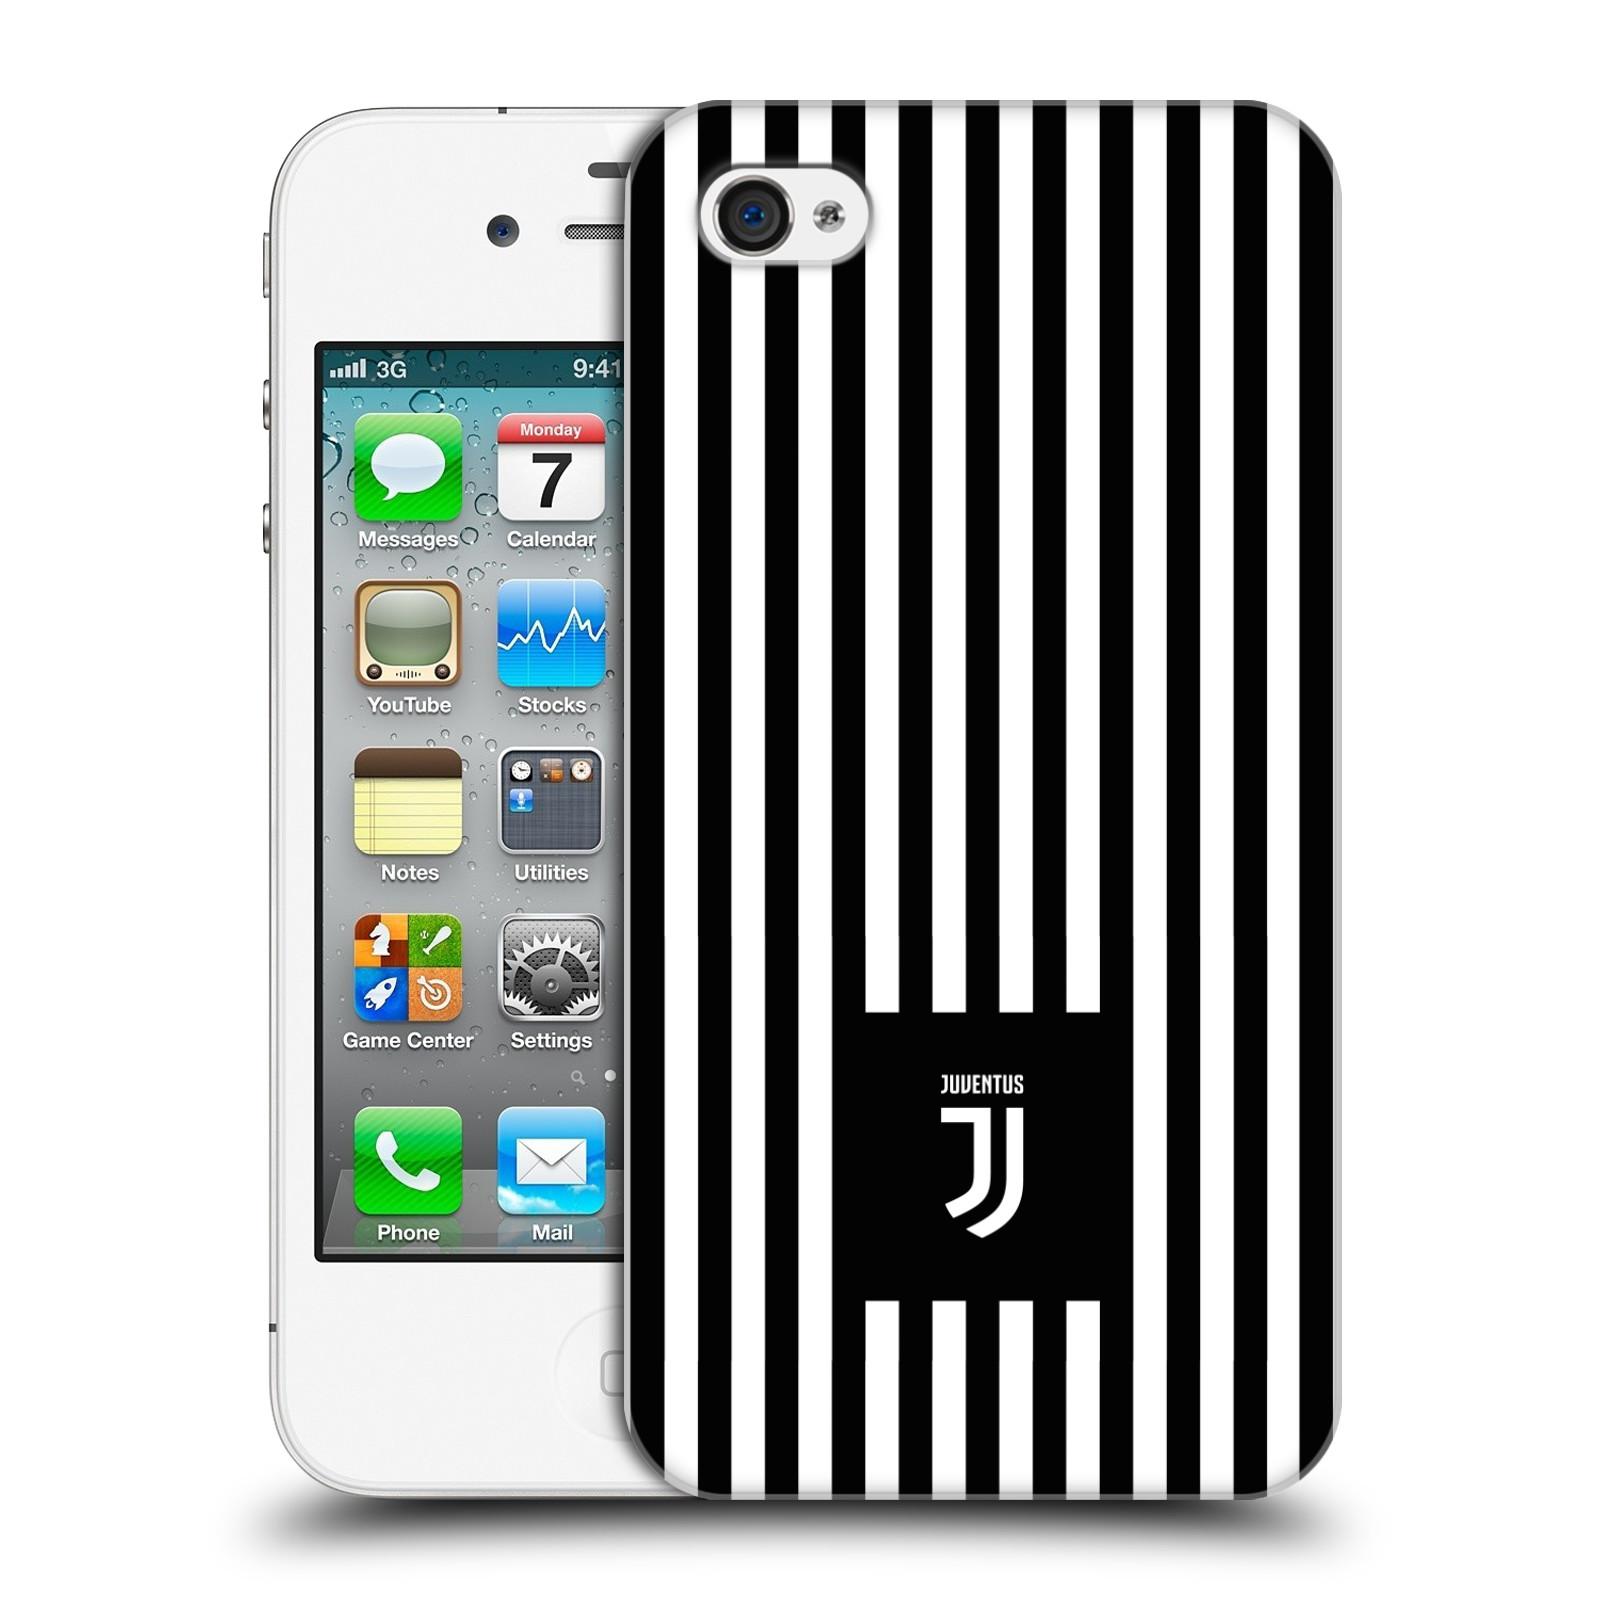 Plastové pouzdro na mobil Apple iPhone 4 a 4S - Head Case - Juventus FC - Nové logo - Pruhy